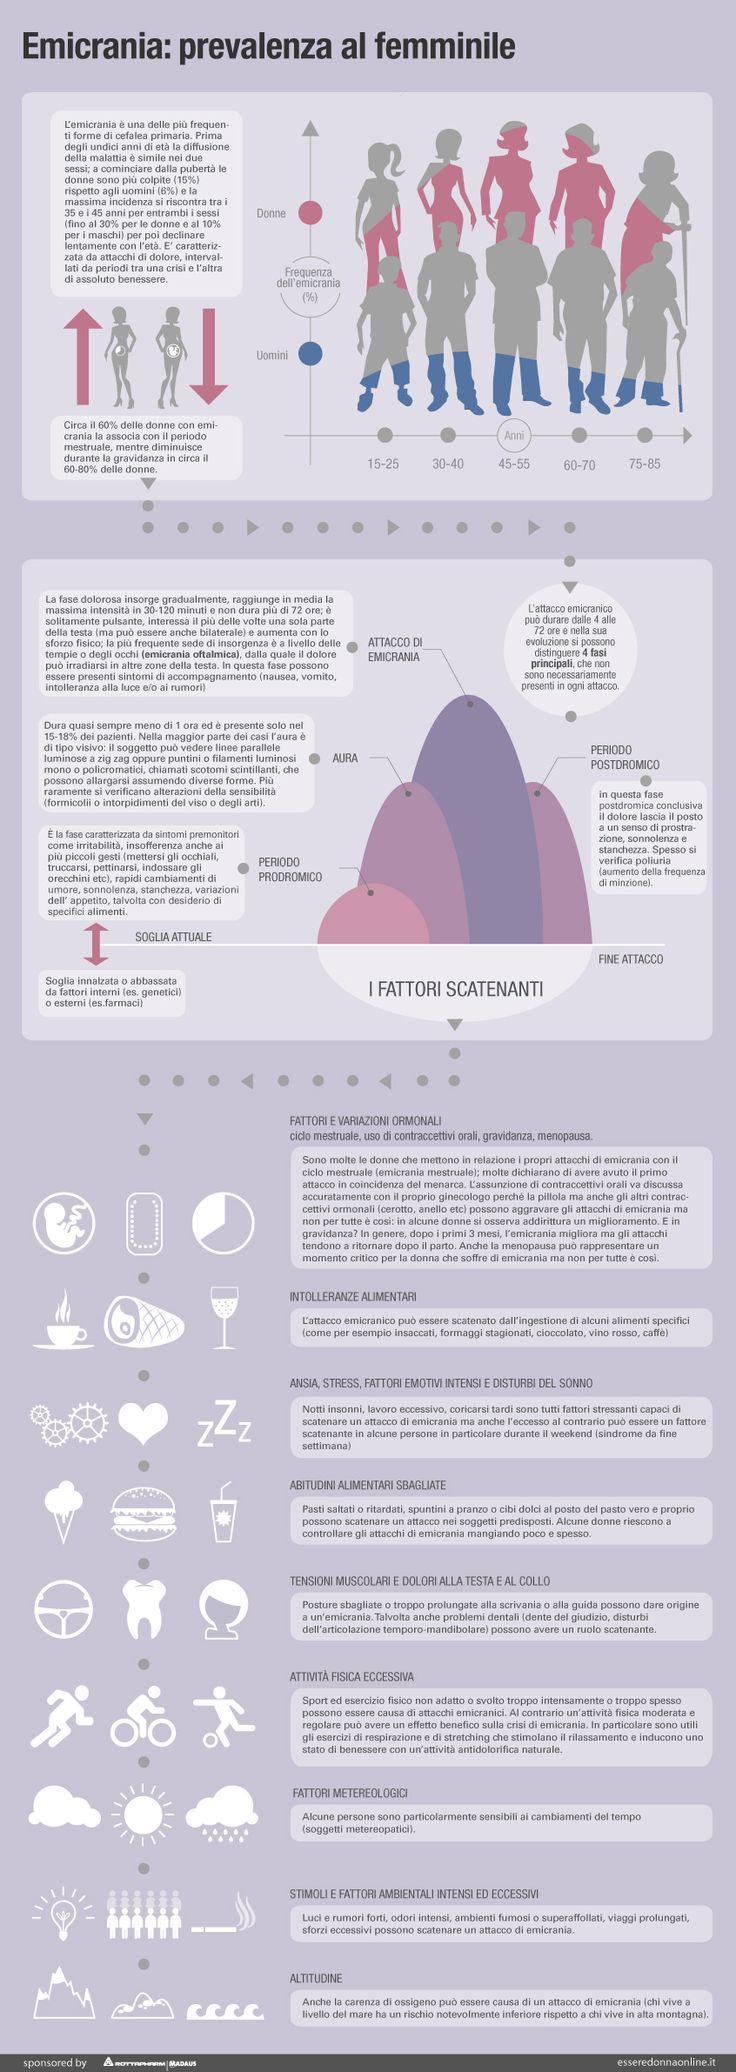 Emicrania: prevalenza al femminile - esseredonnaonline